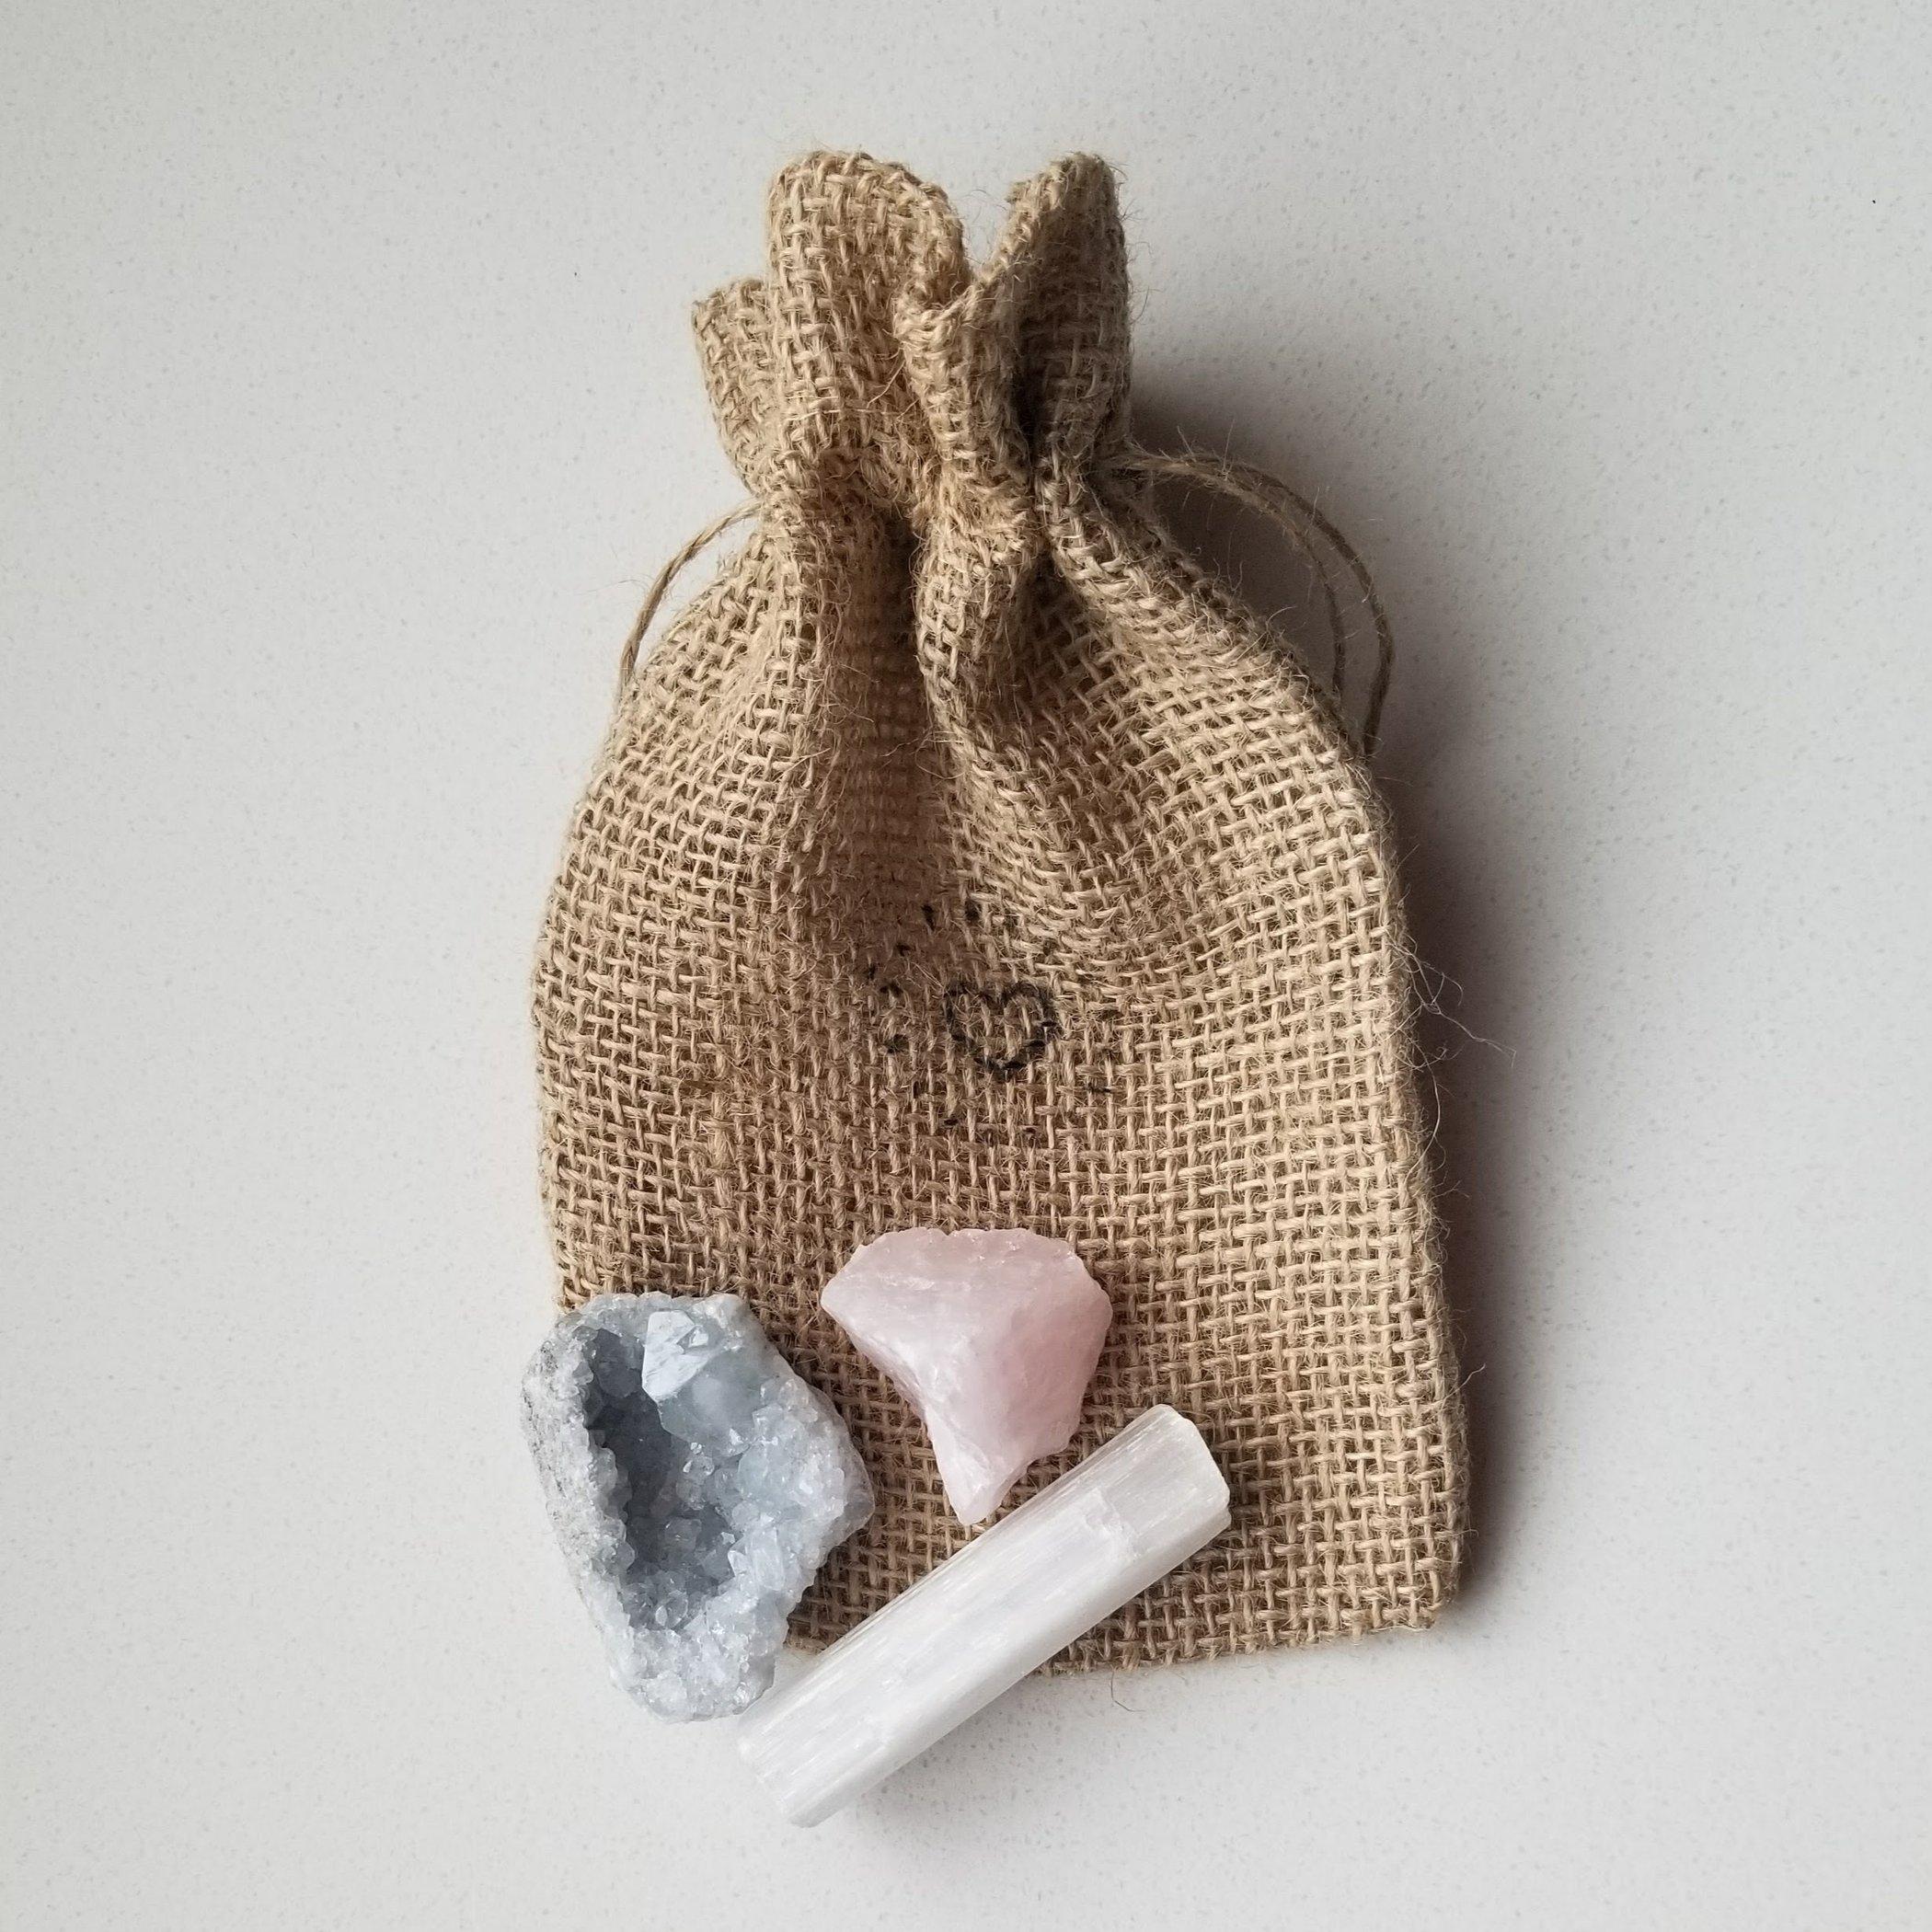 Love + Peace + Creativity Crystals | akindboutique.com #TheKindBrands